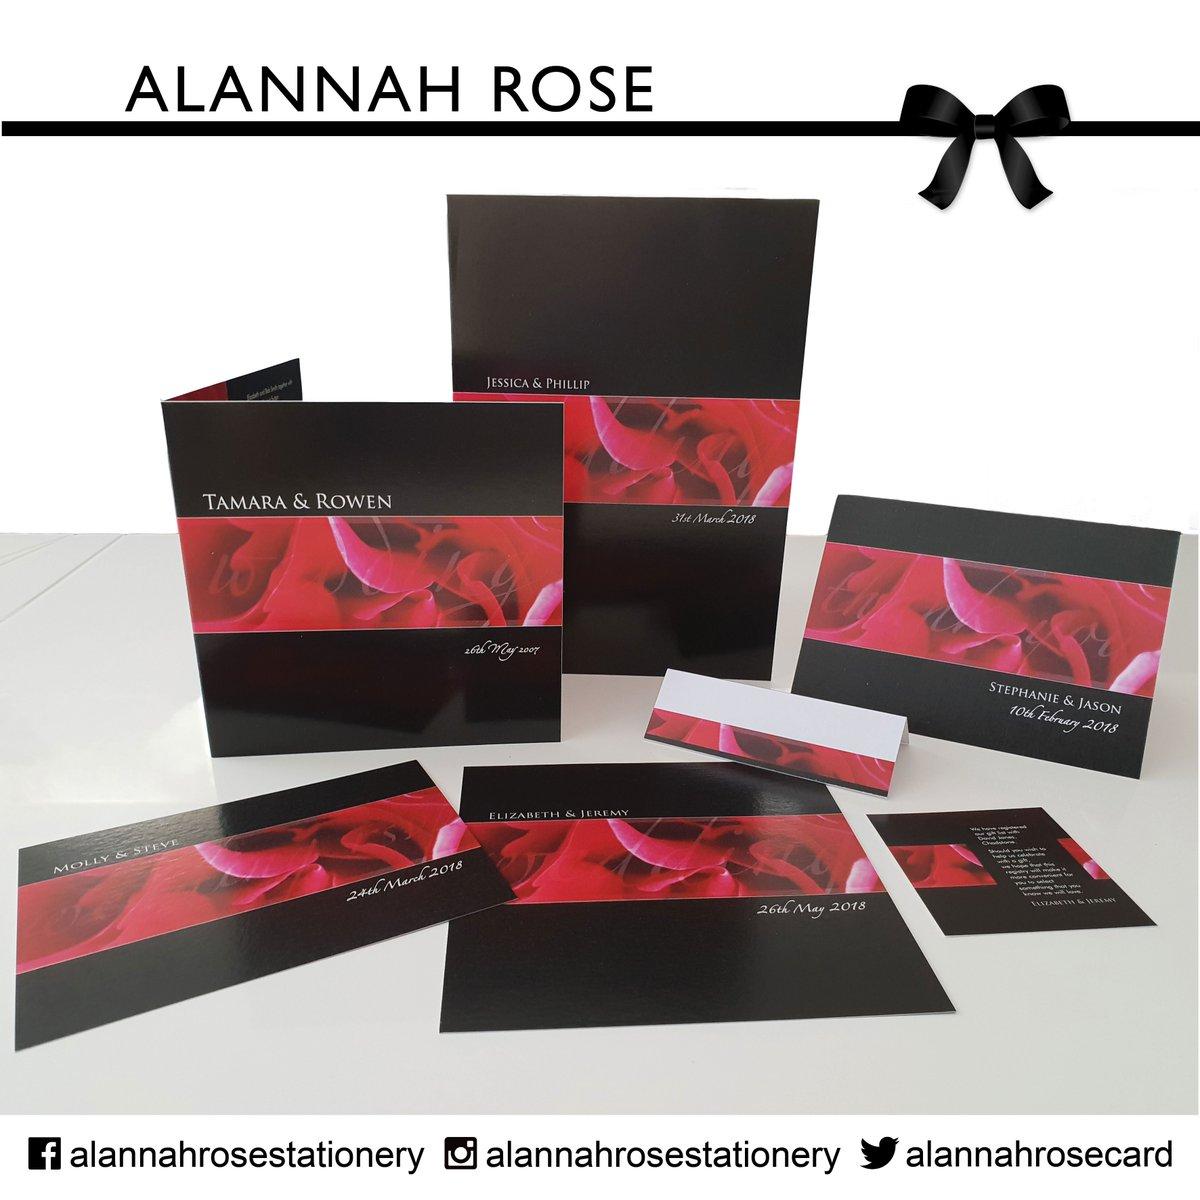 Alannah Rose (@alannahrosecard) | Twitter